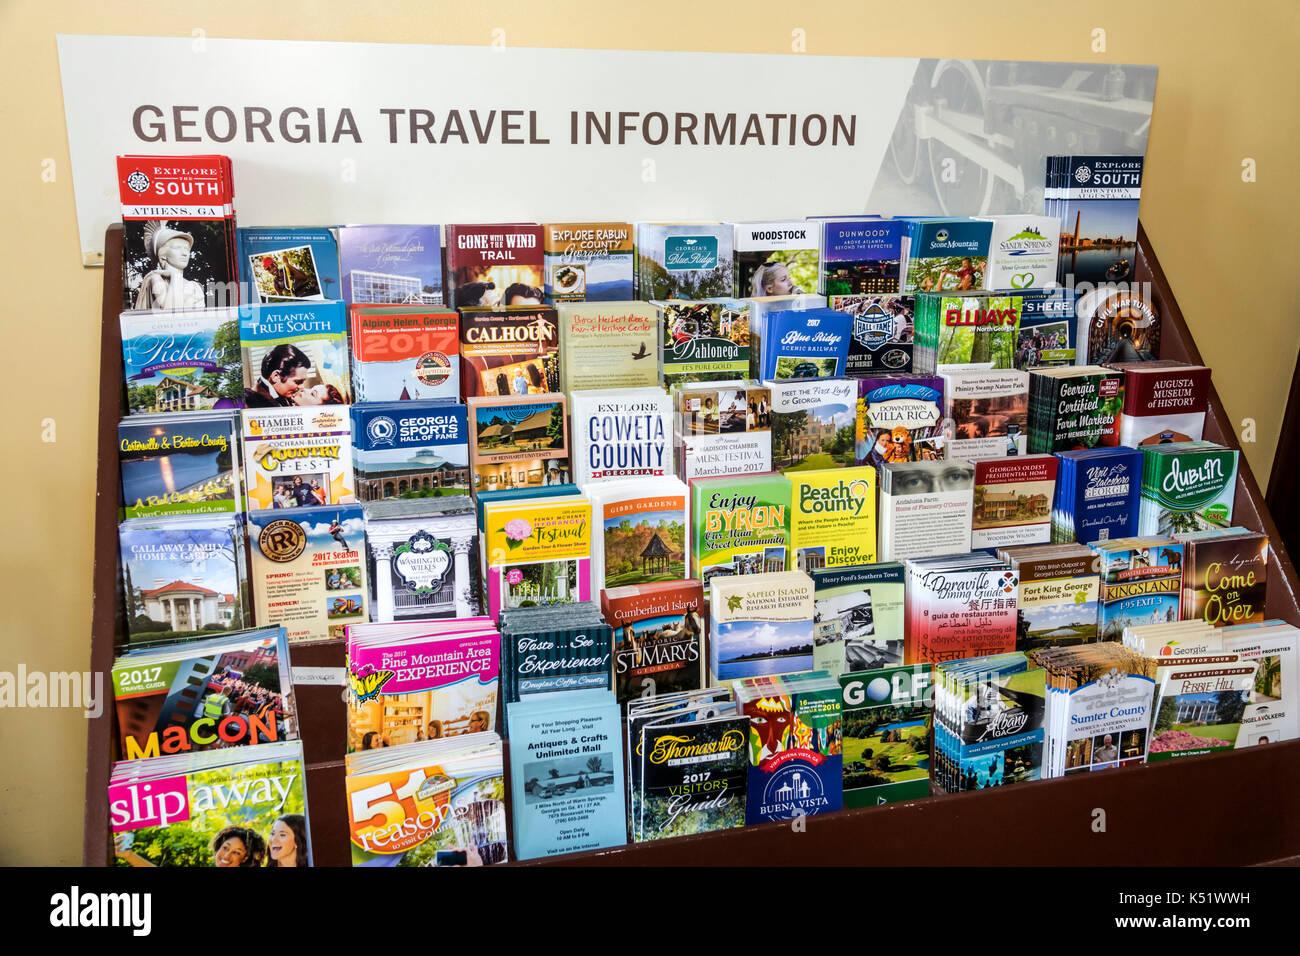 Savannah Georgia Visitors Information Center inside travel brochure gift shop - Stock Image